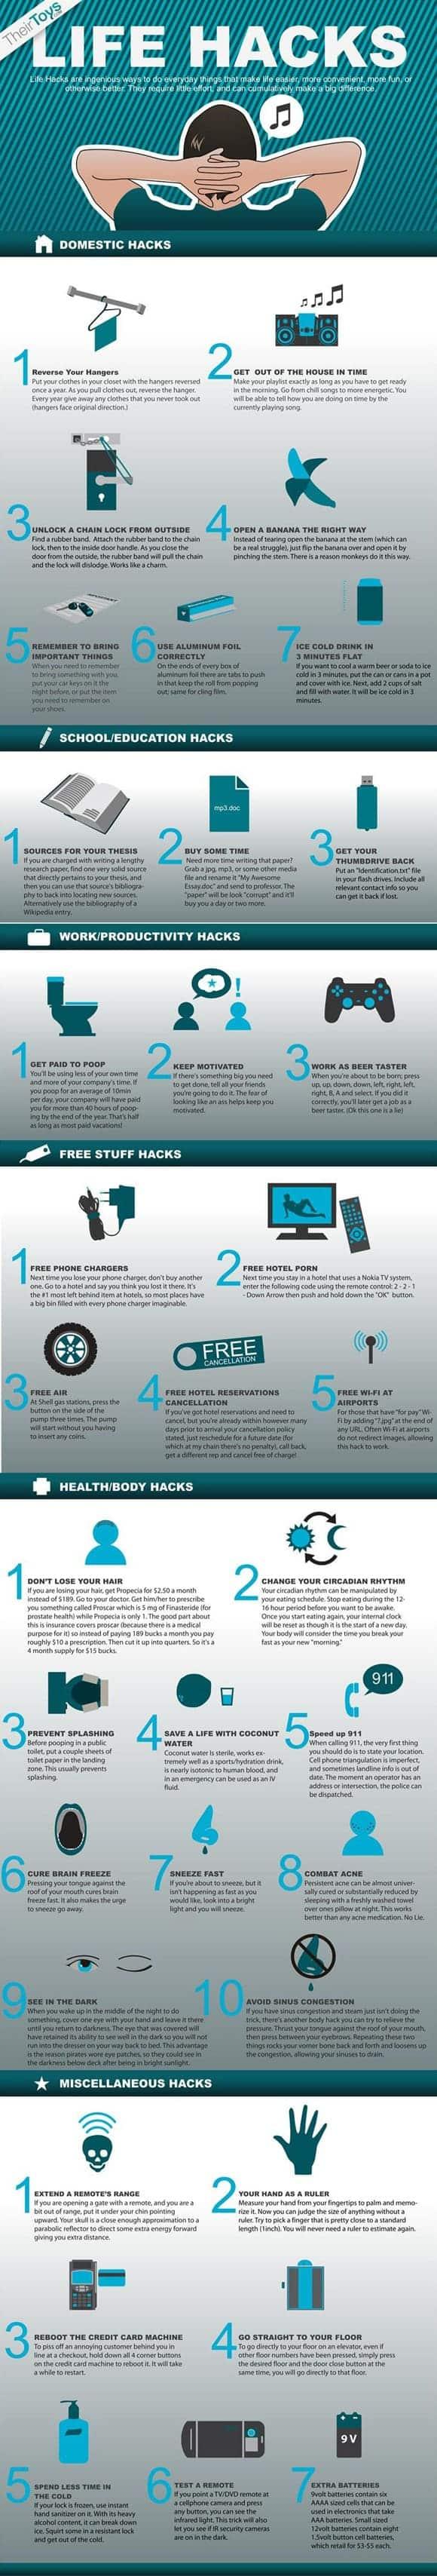 Life Hacks [infographic]